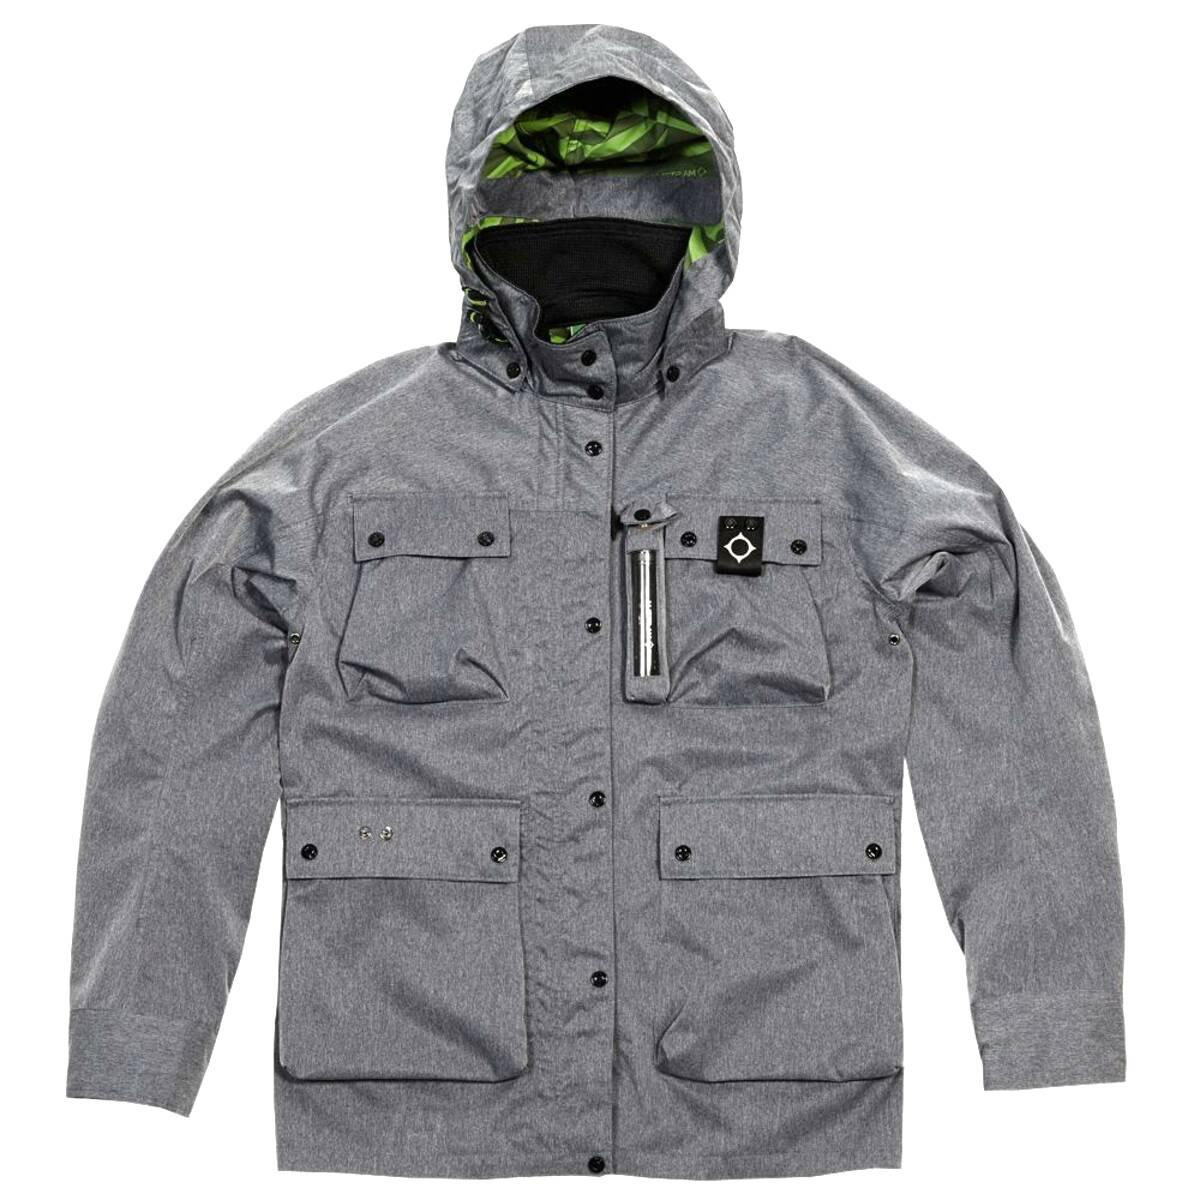 ma strum jacket for sale